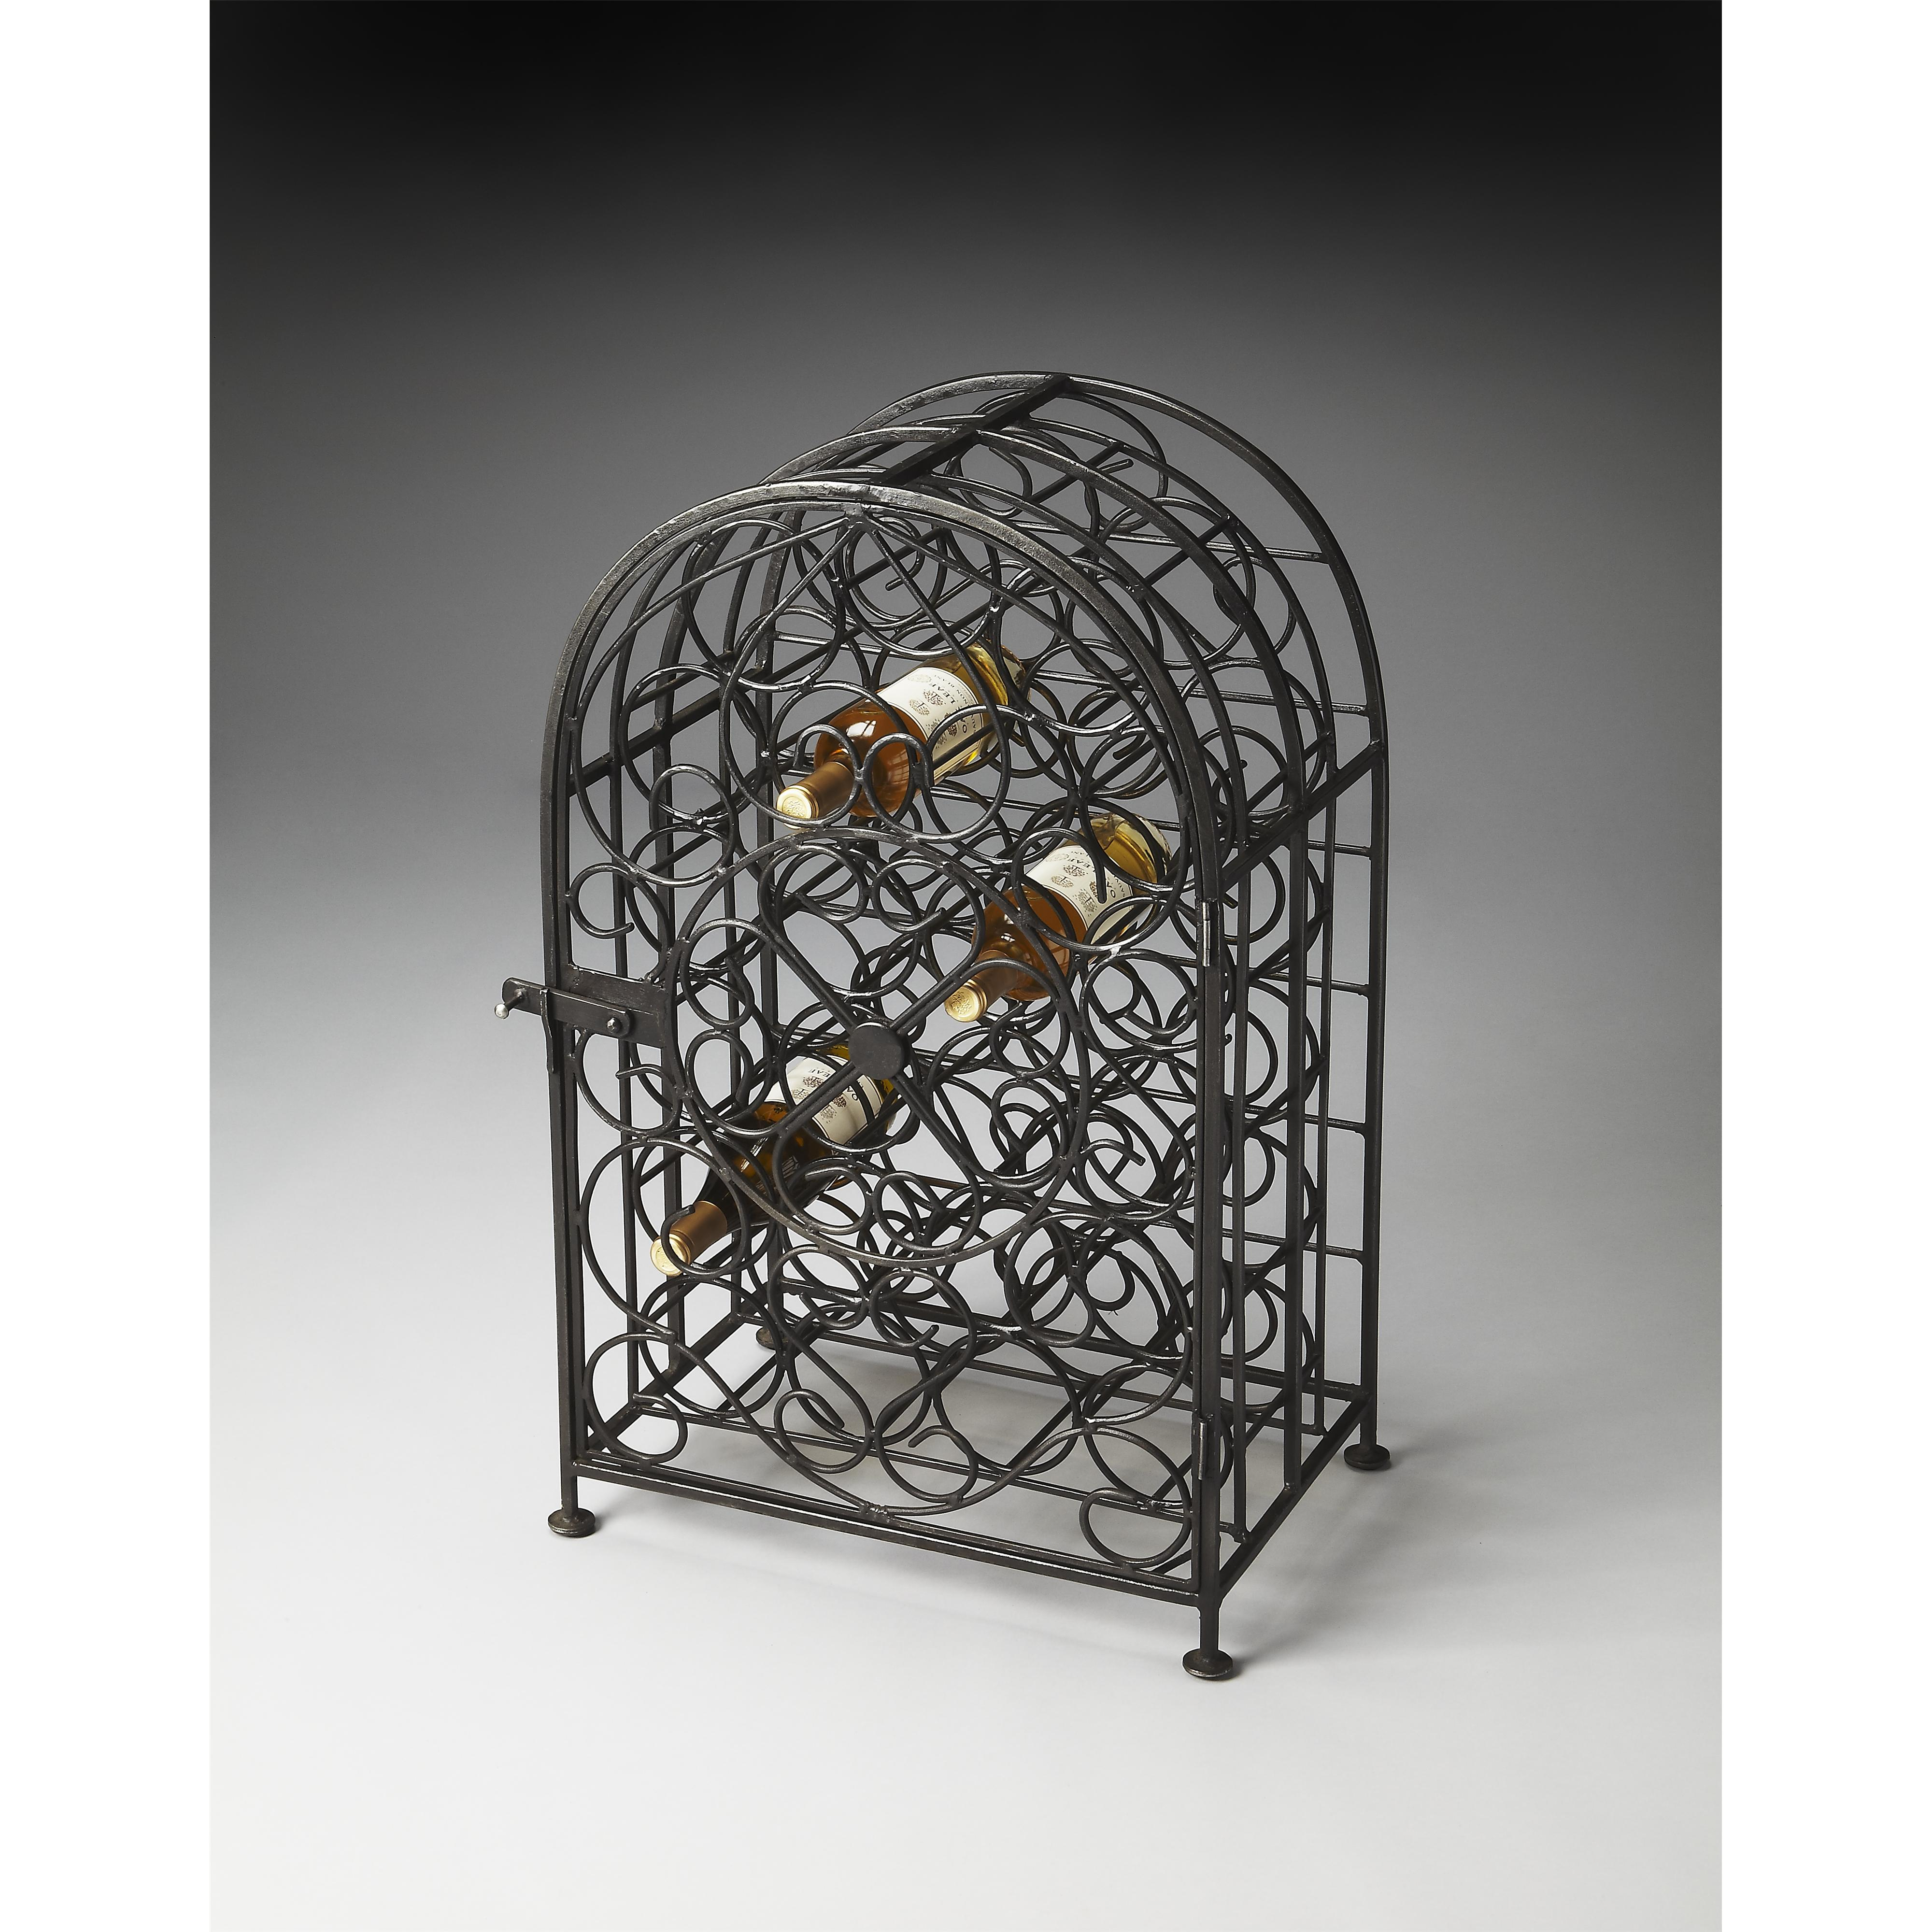 Butler Specialty Company Metalworks Wine Rack - Item Number: 3119025